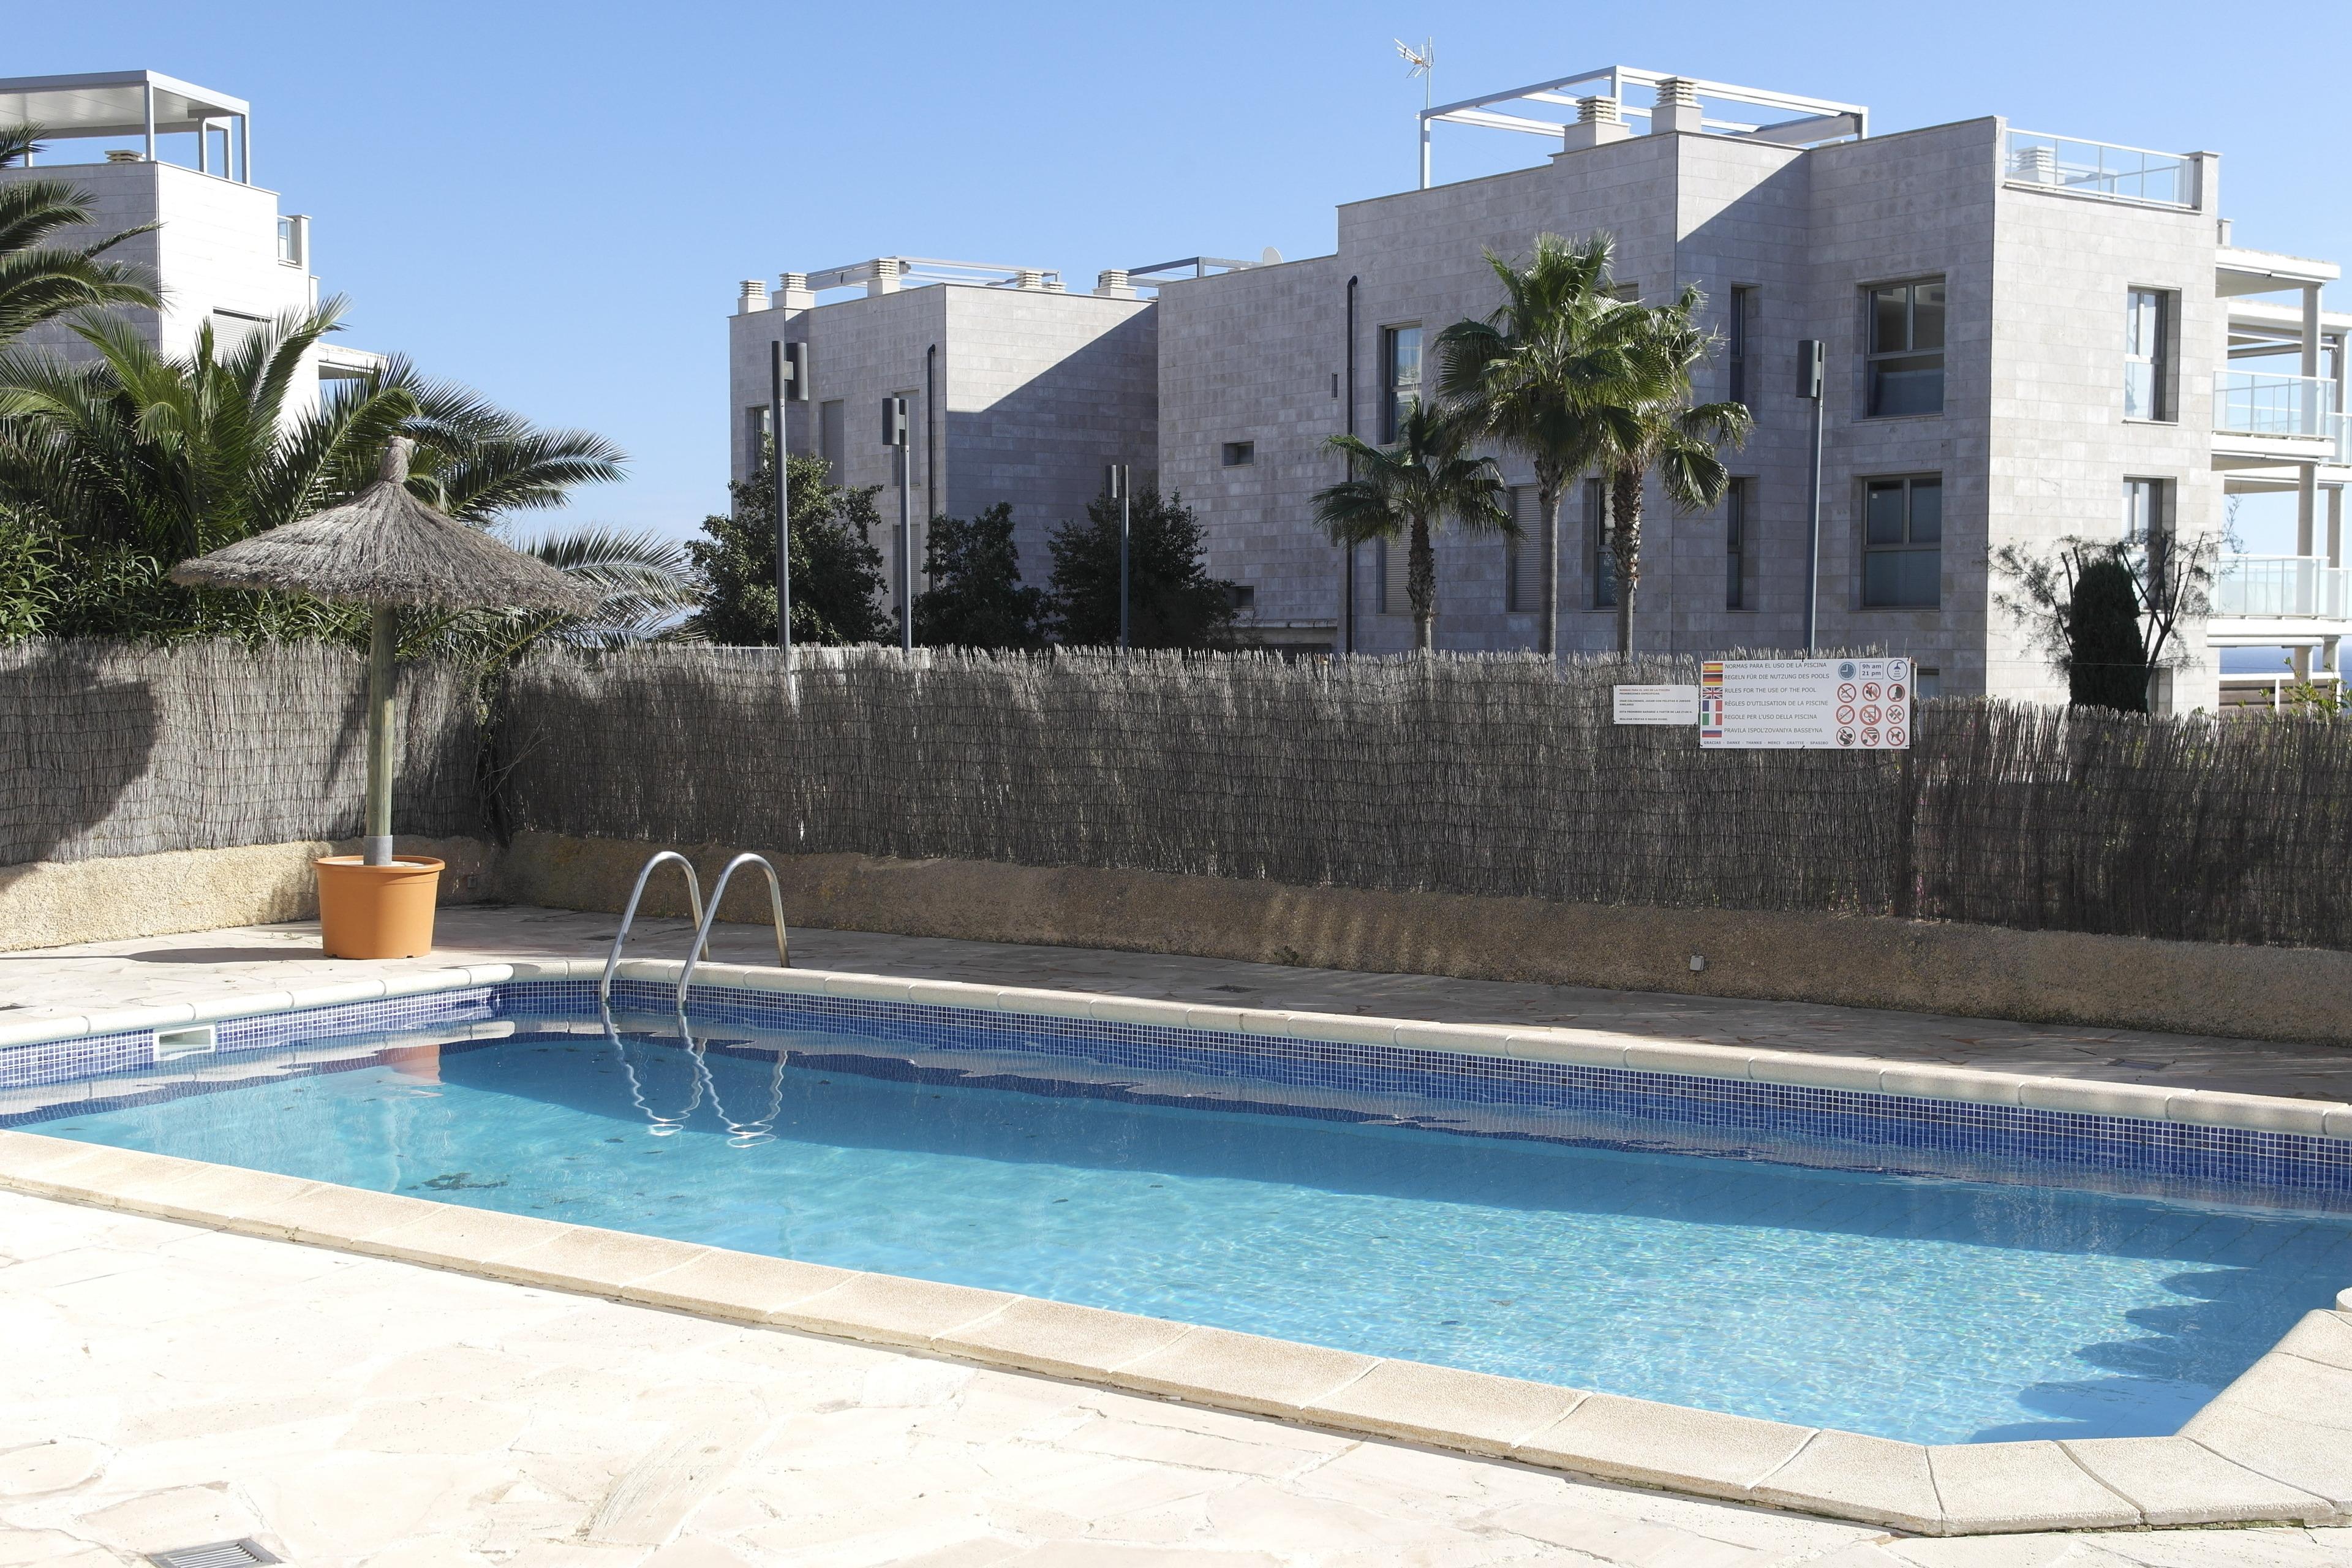 Apartment Balkon Pool 0 2km zum Meer WLAN Küche Tennisplatz